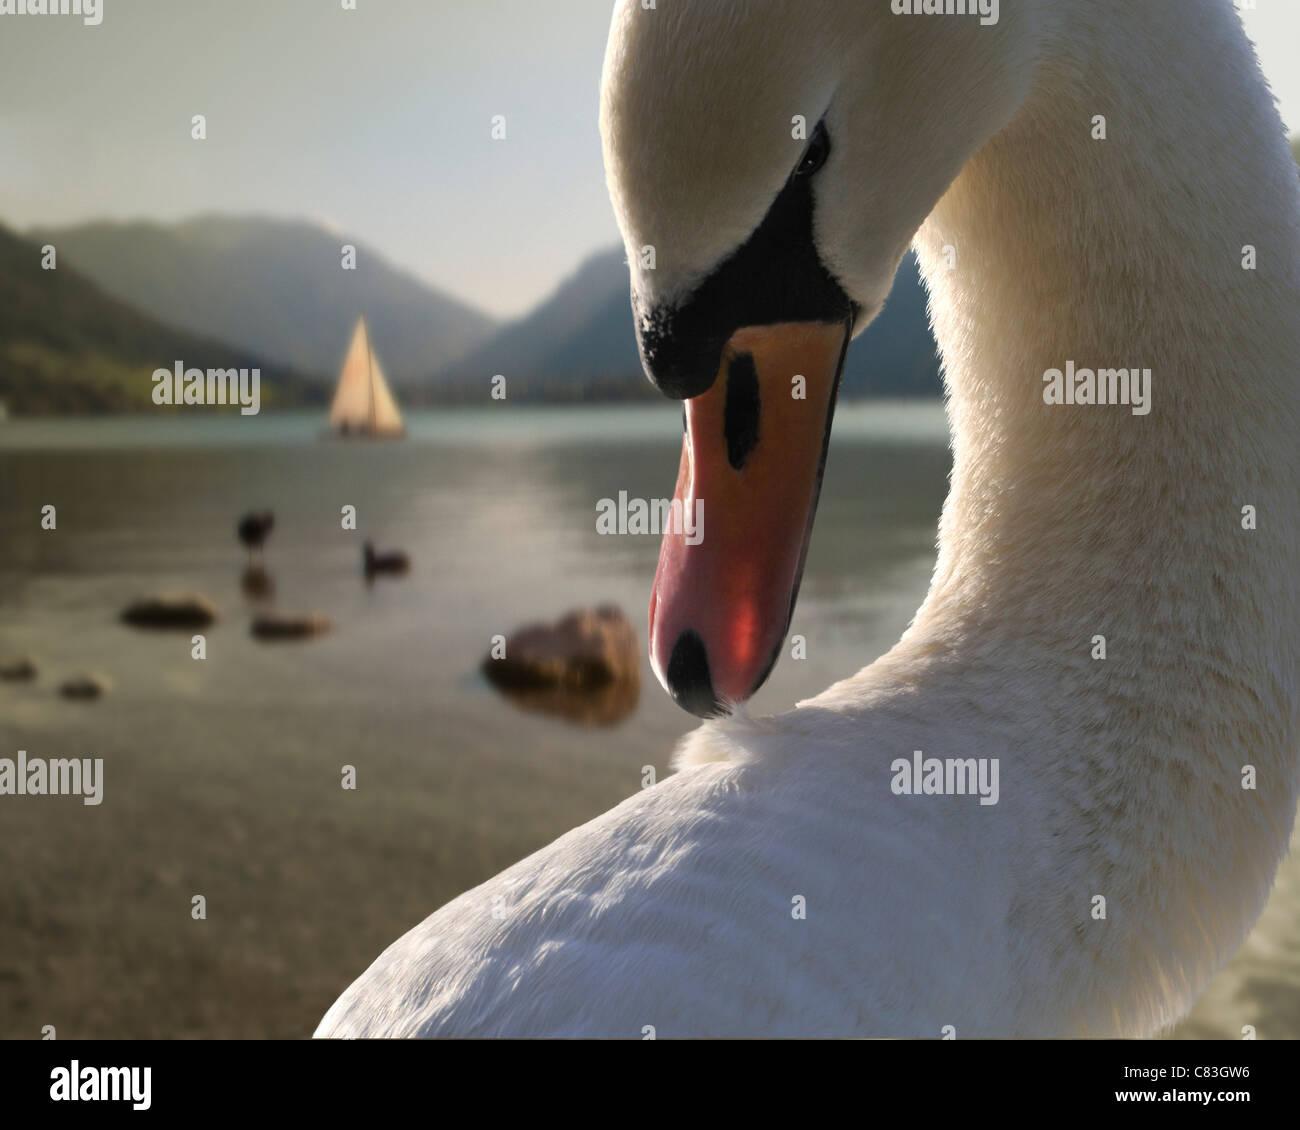 DE - Bayern: Swan am See Schliersee Stockbild